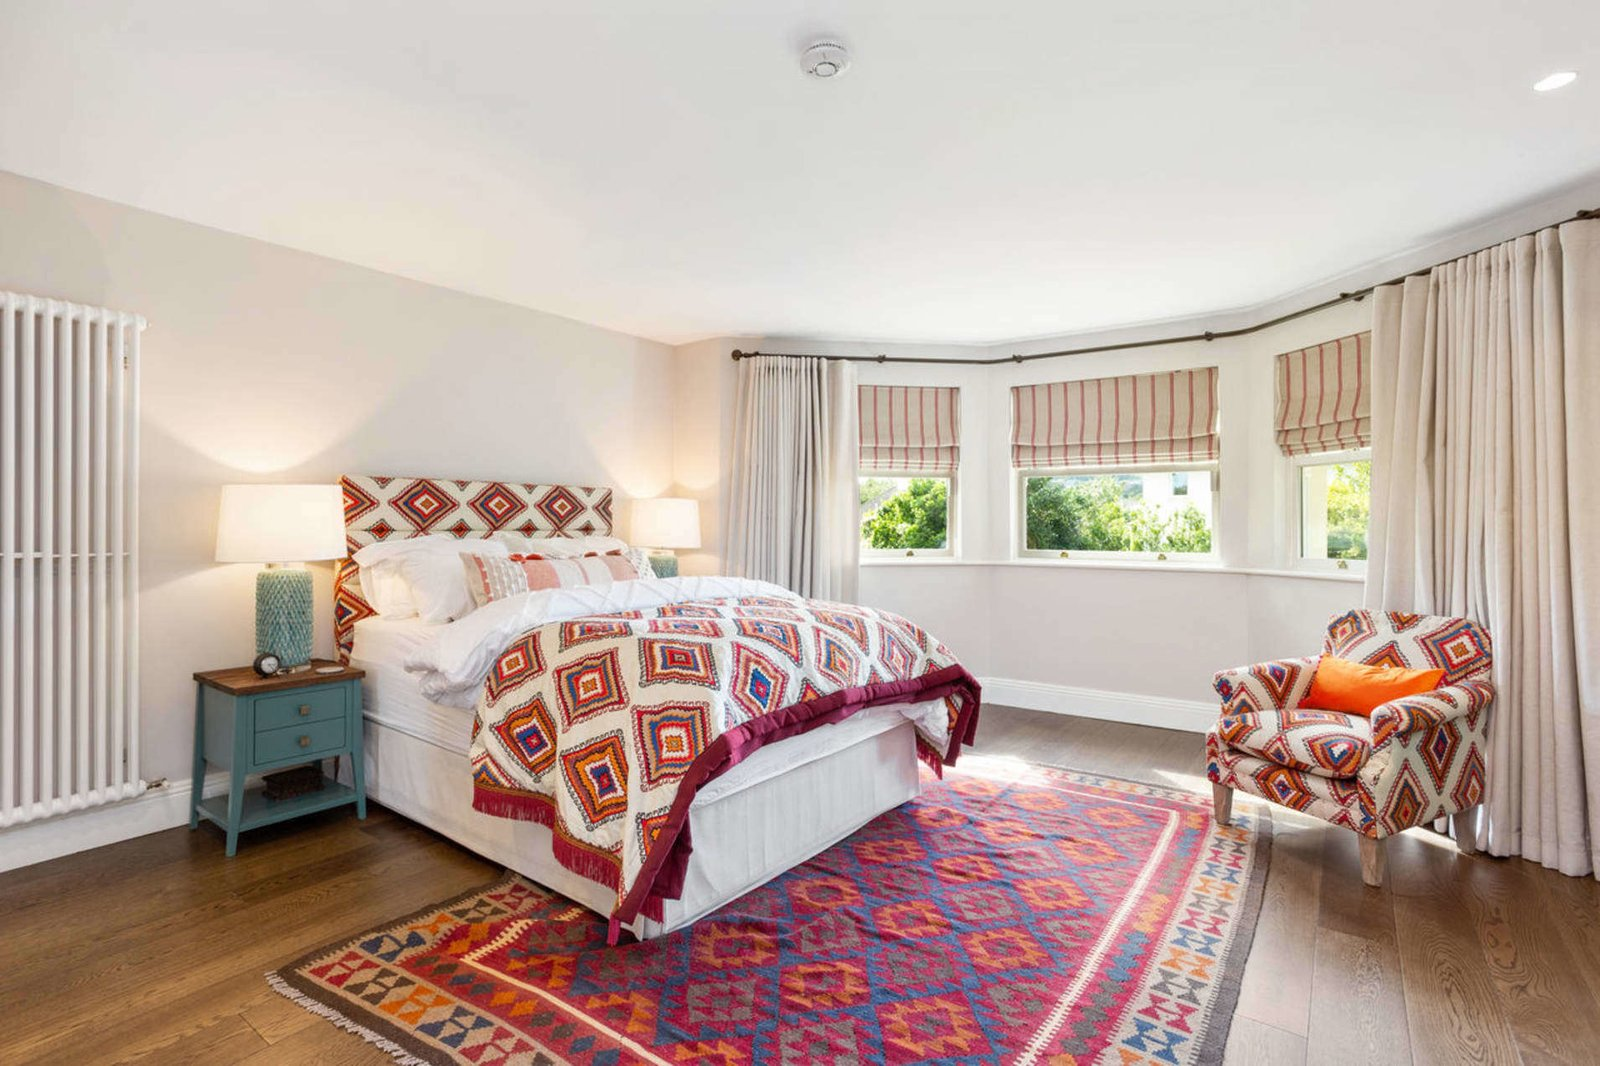 Saoirse Ronan Pine Lodge Ireland real estate bedroom